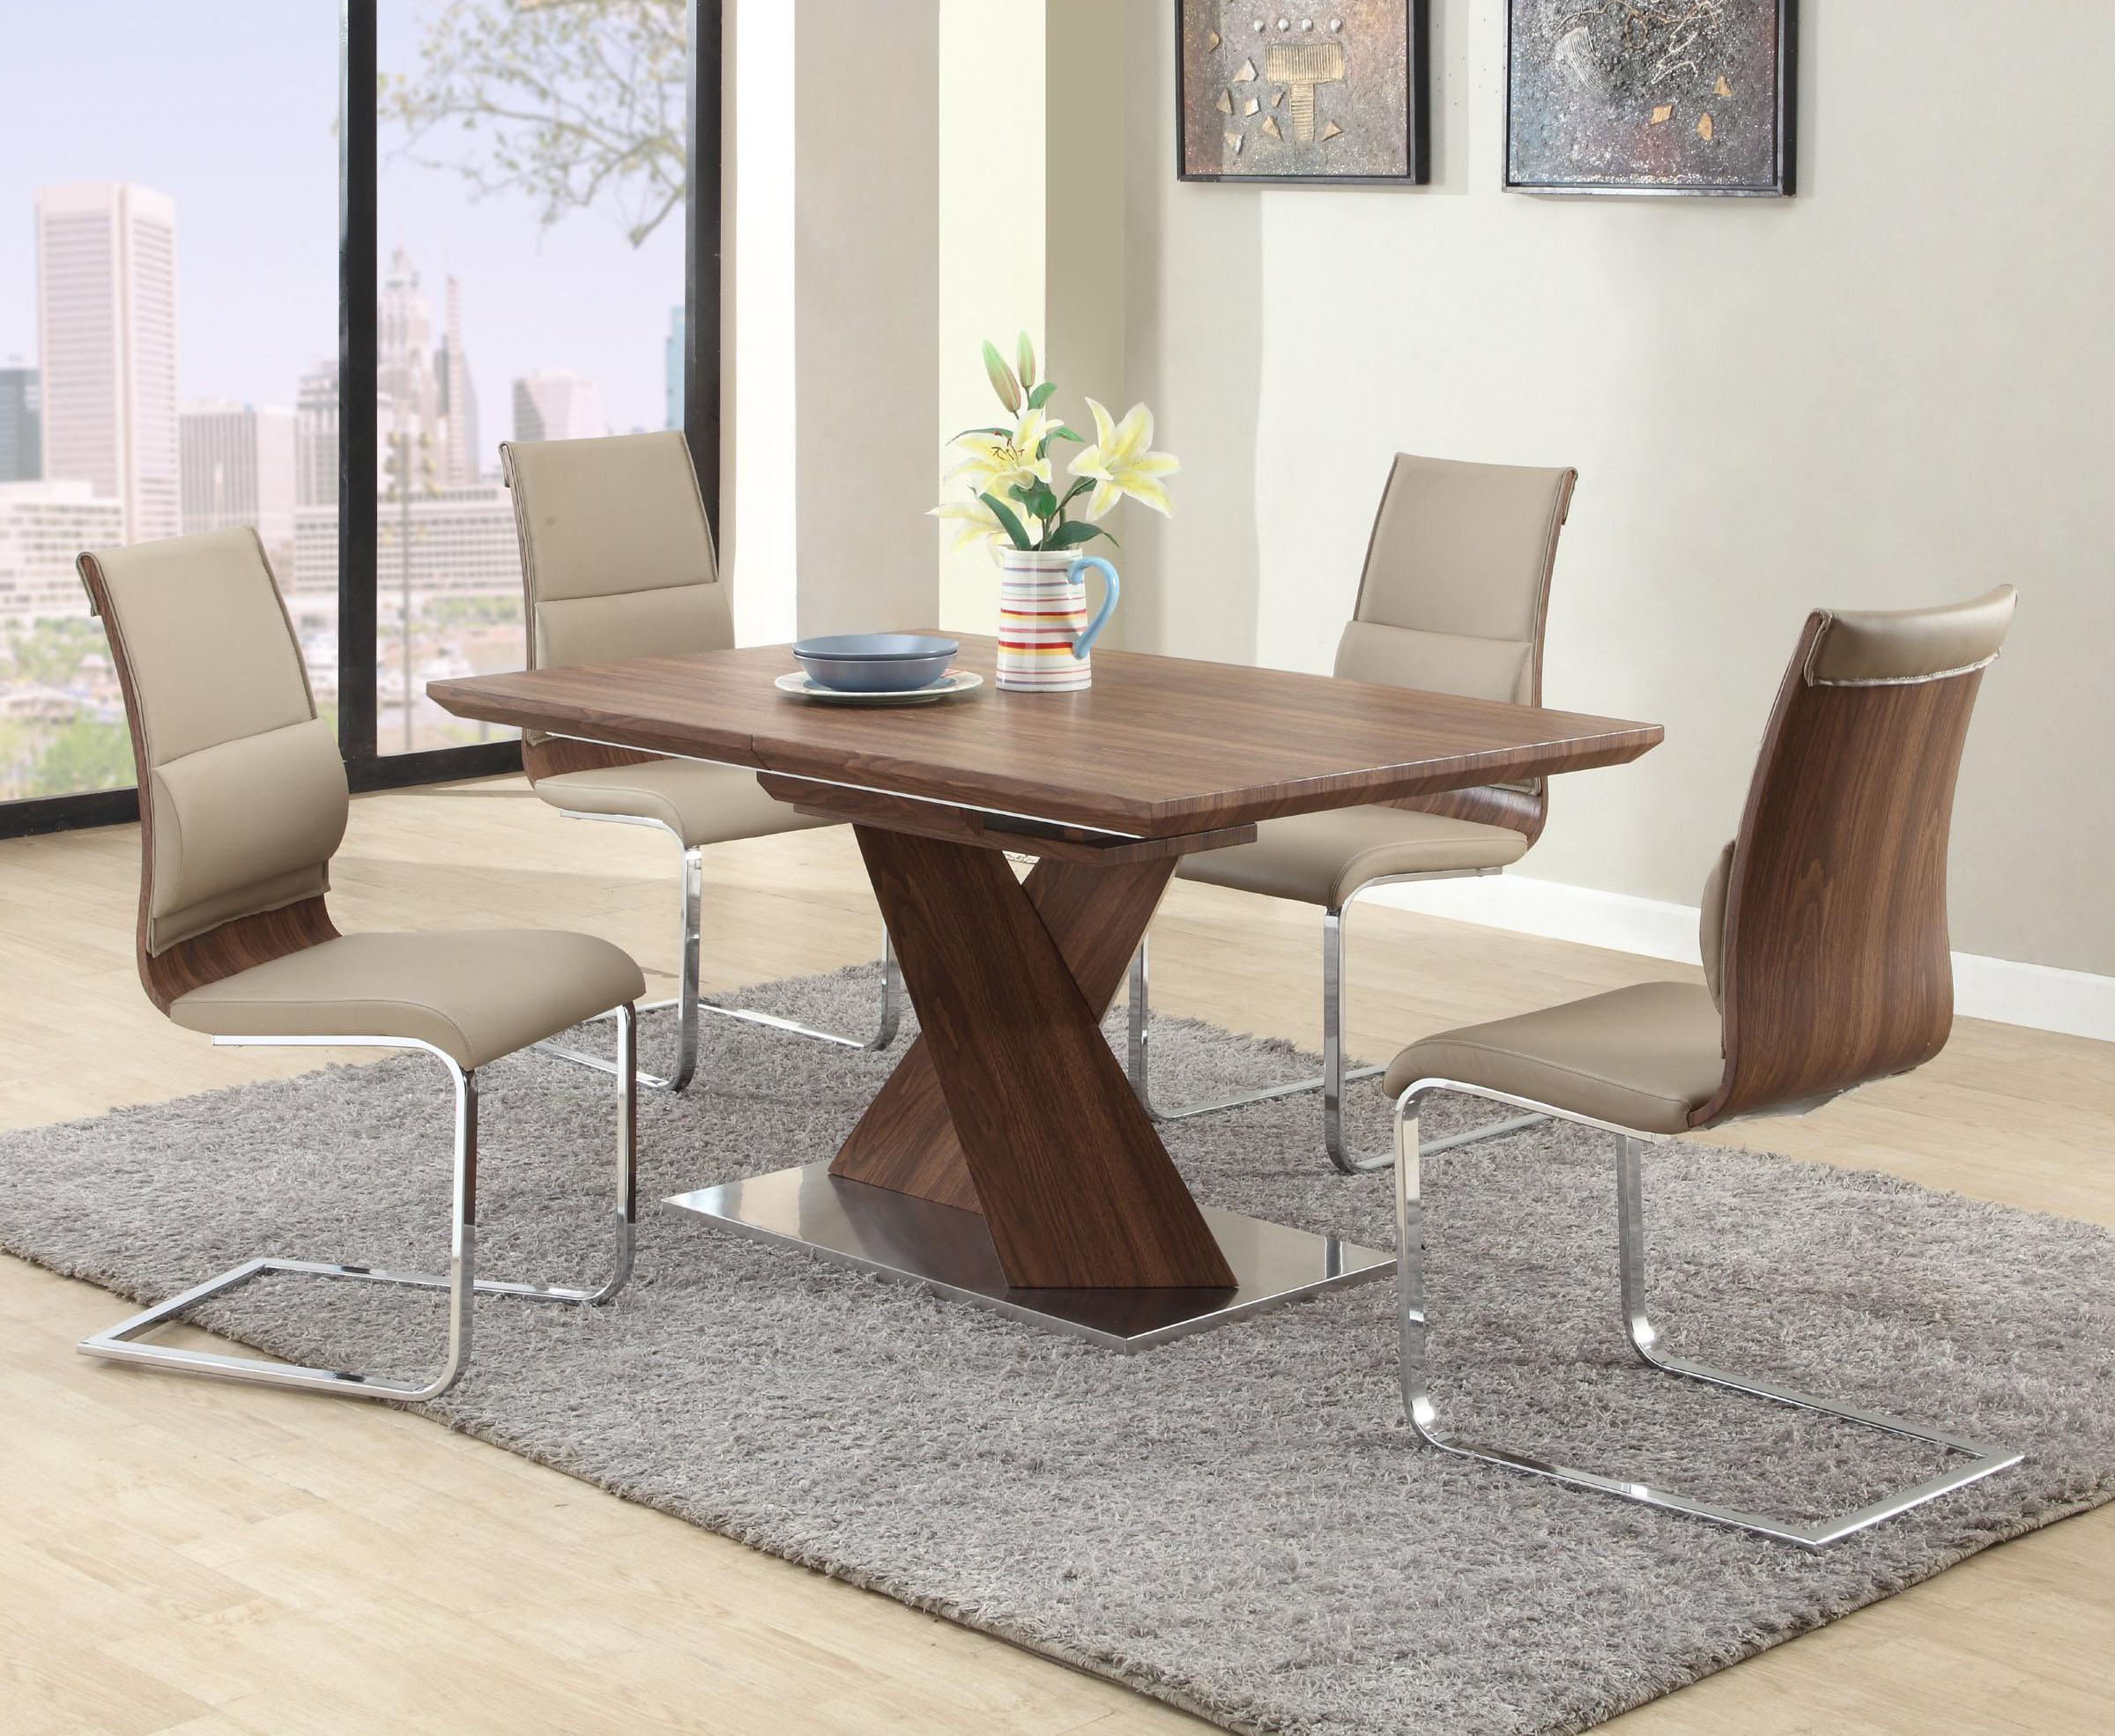 Extendable In Wood Modern Dining Room Las Vegas Nevada CHBET